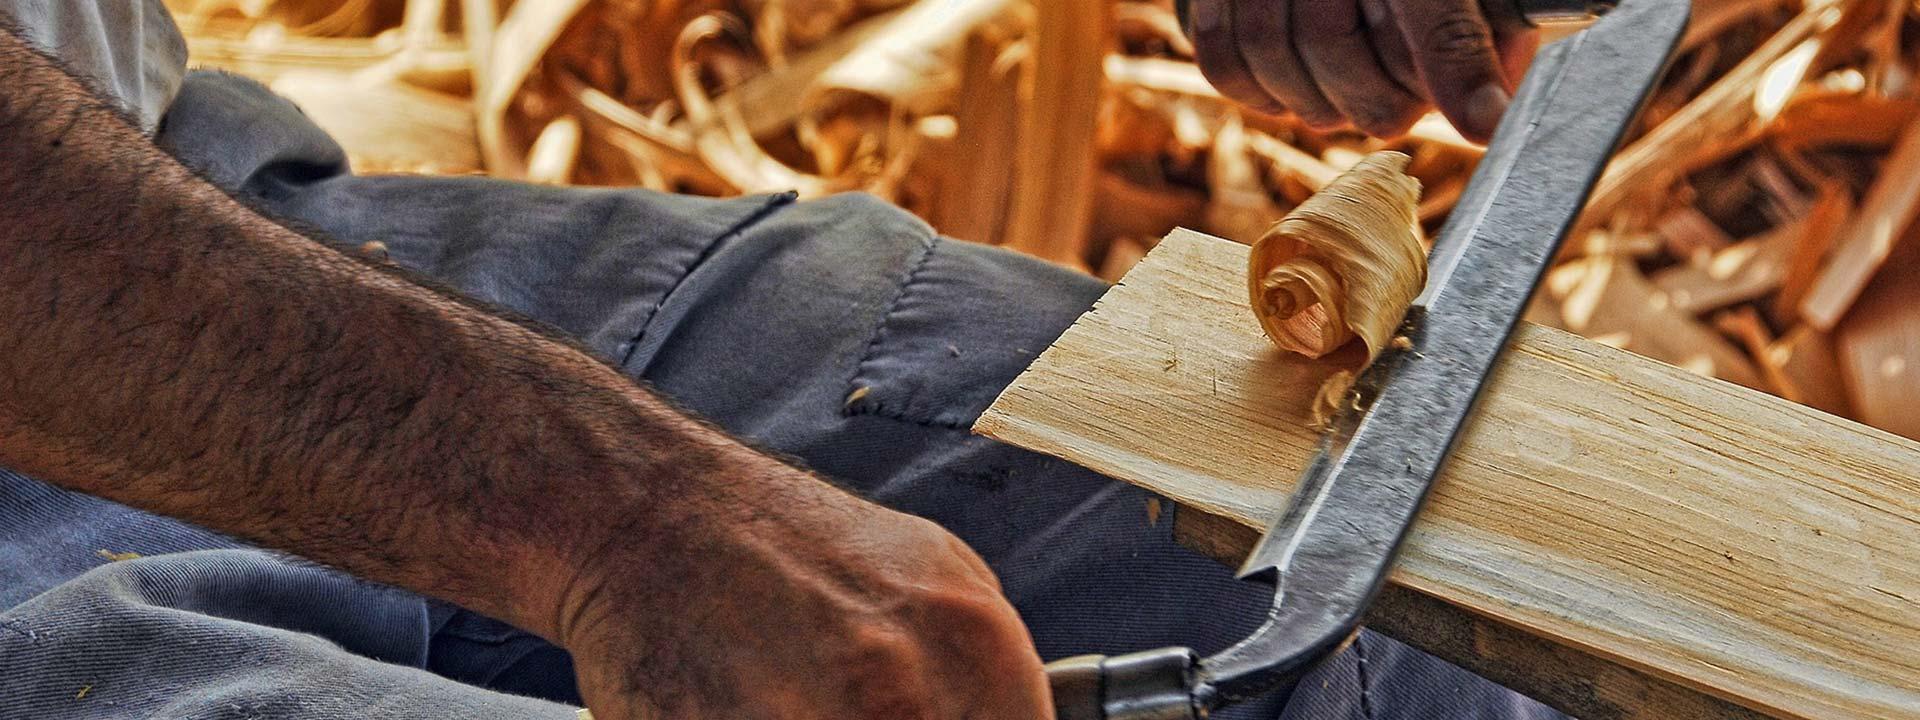 Carpentry Pic Wood